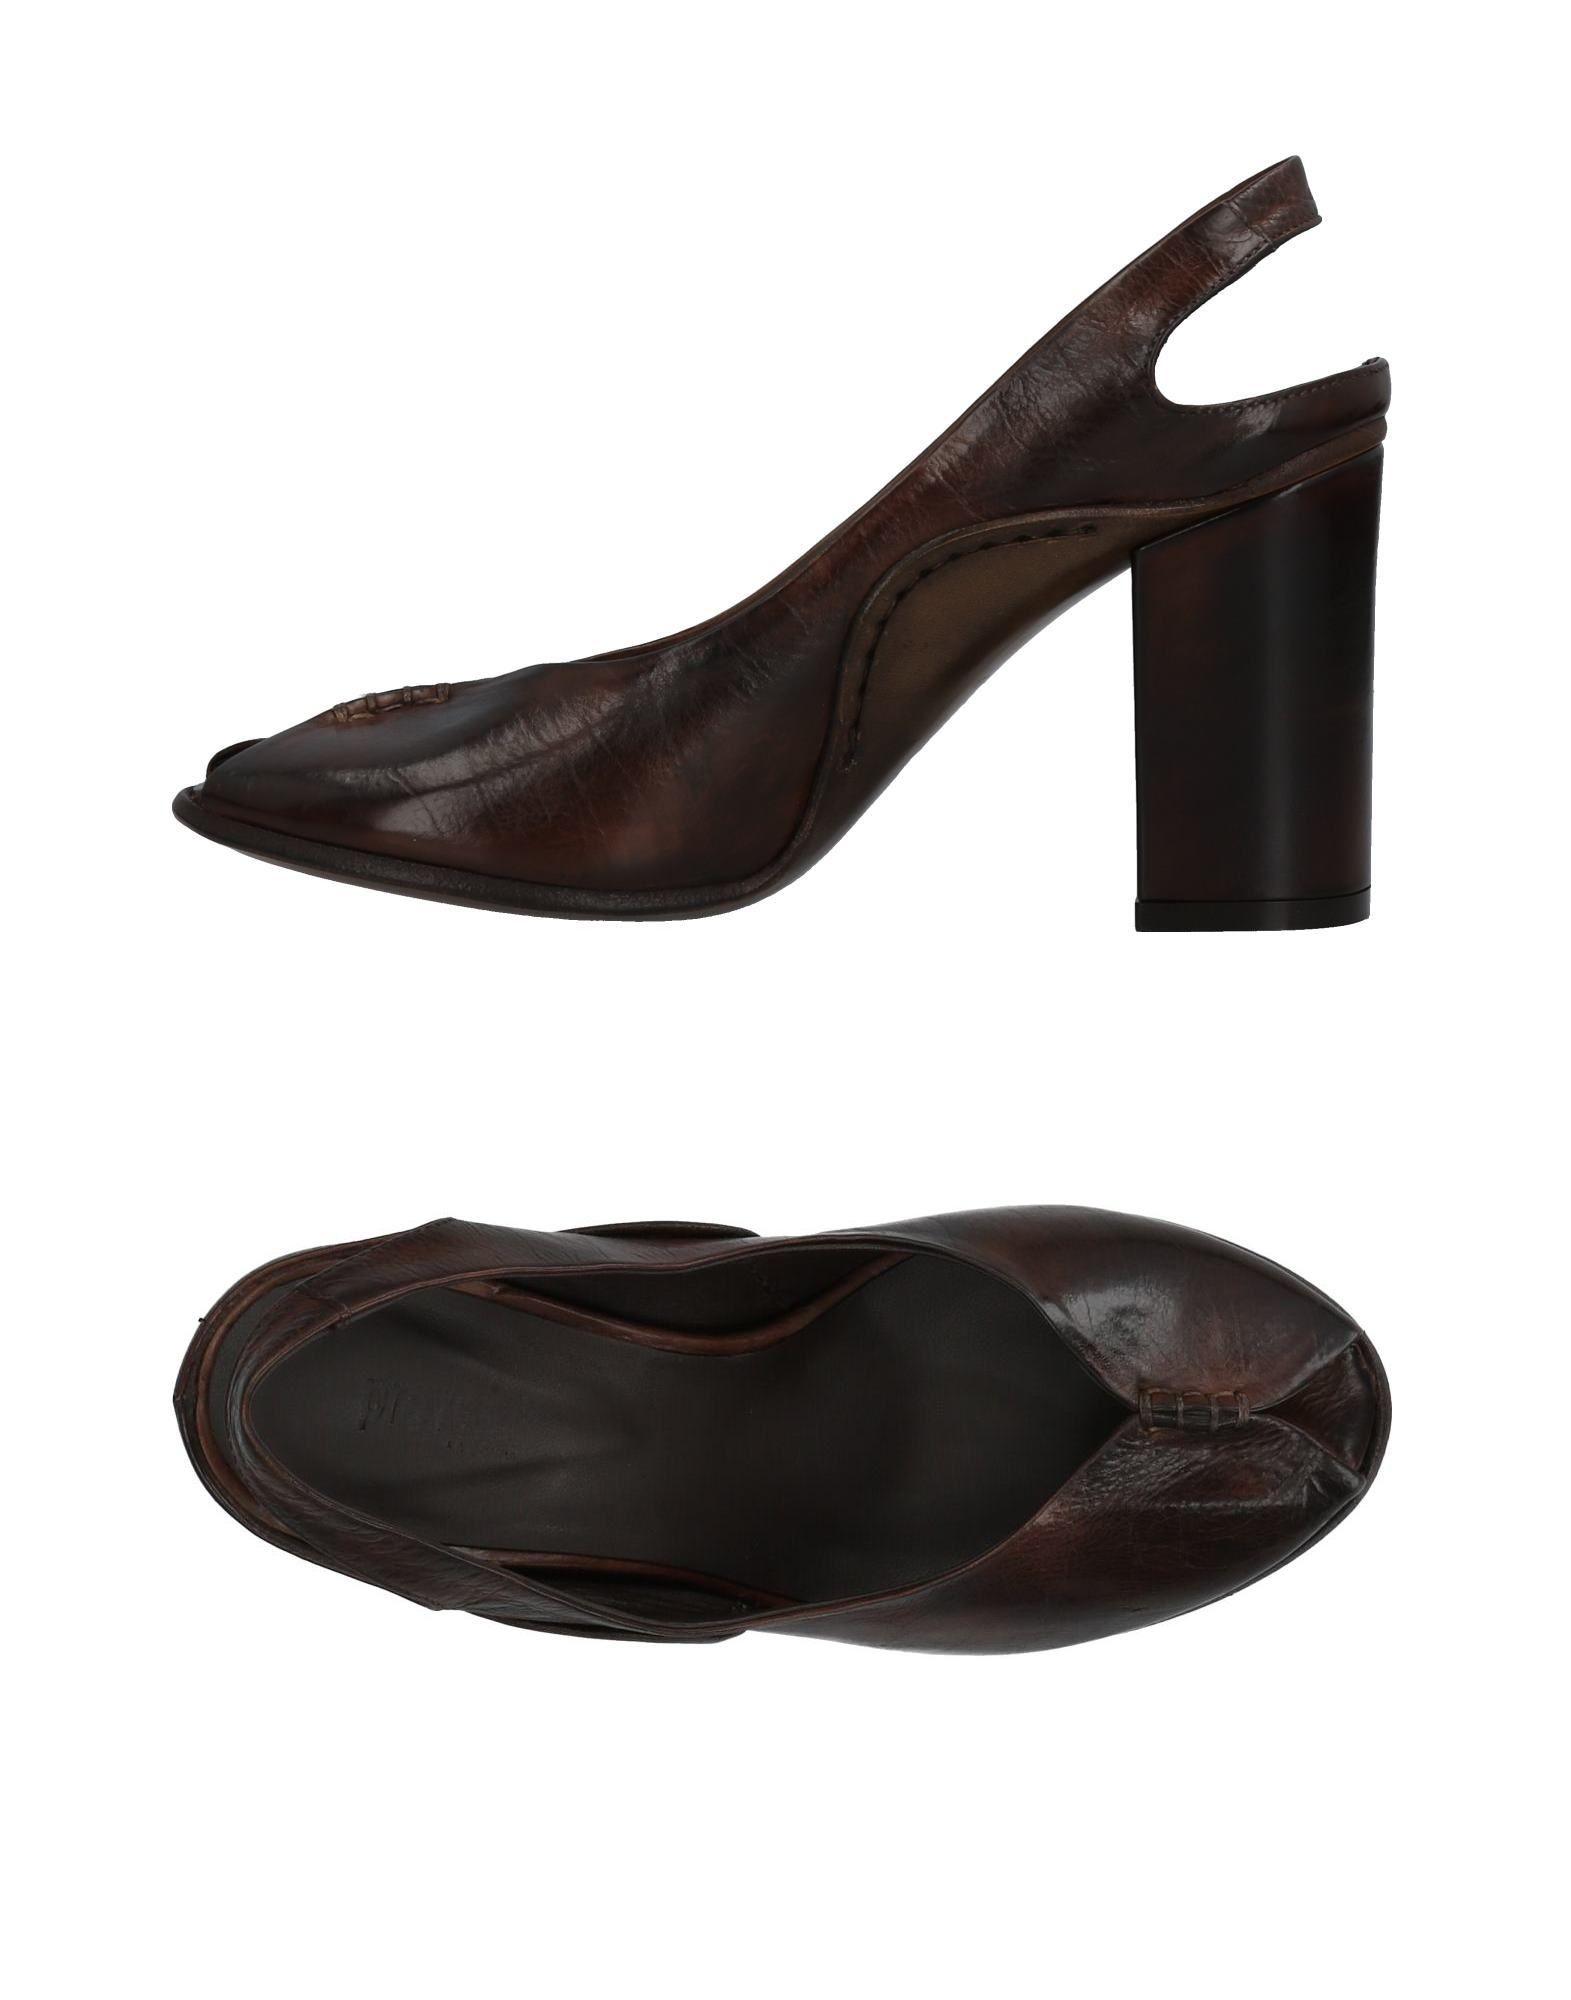 Sandales Preventi Femme - Sandales Preventi sur